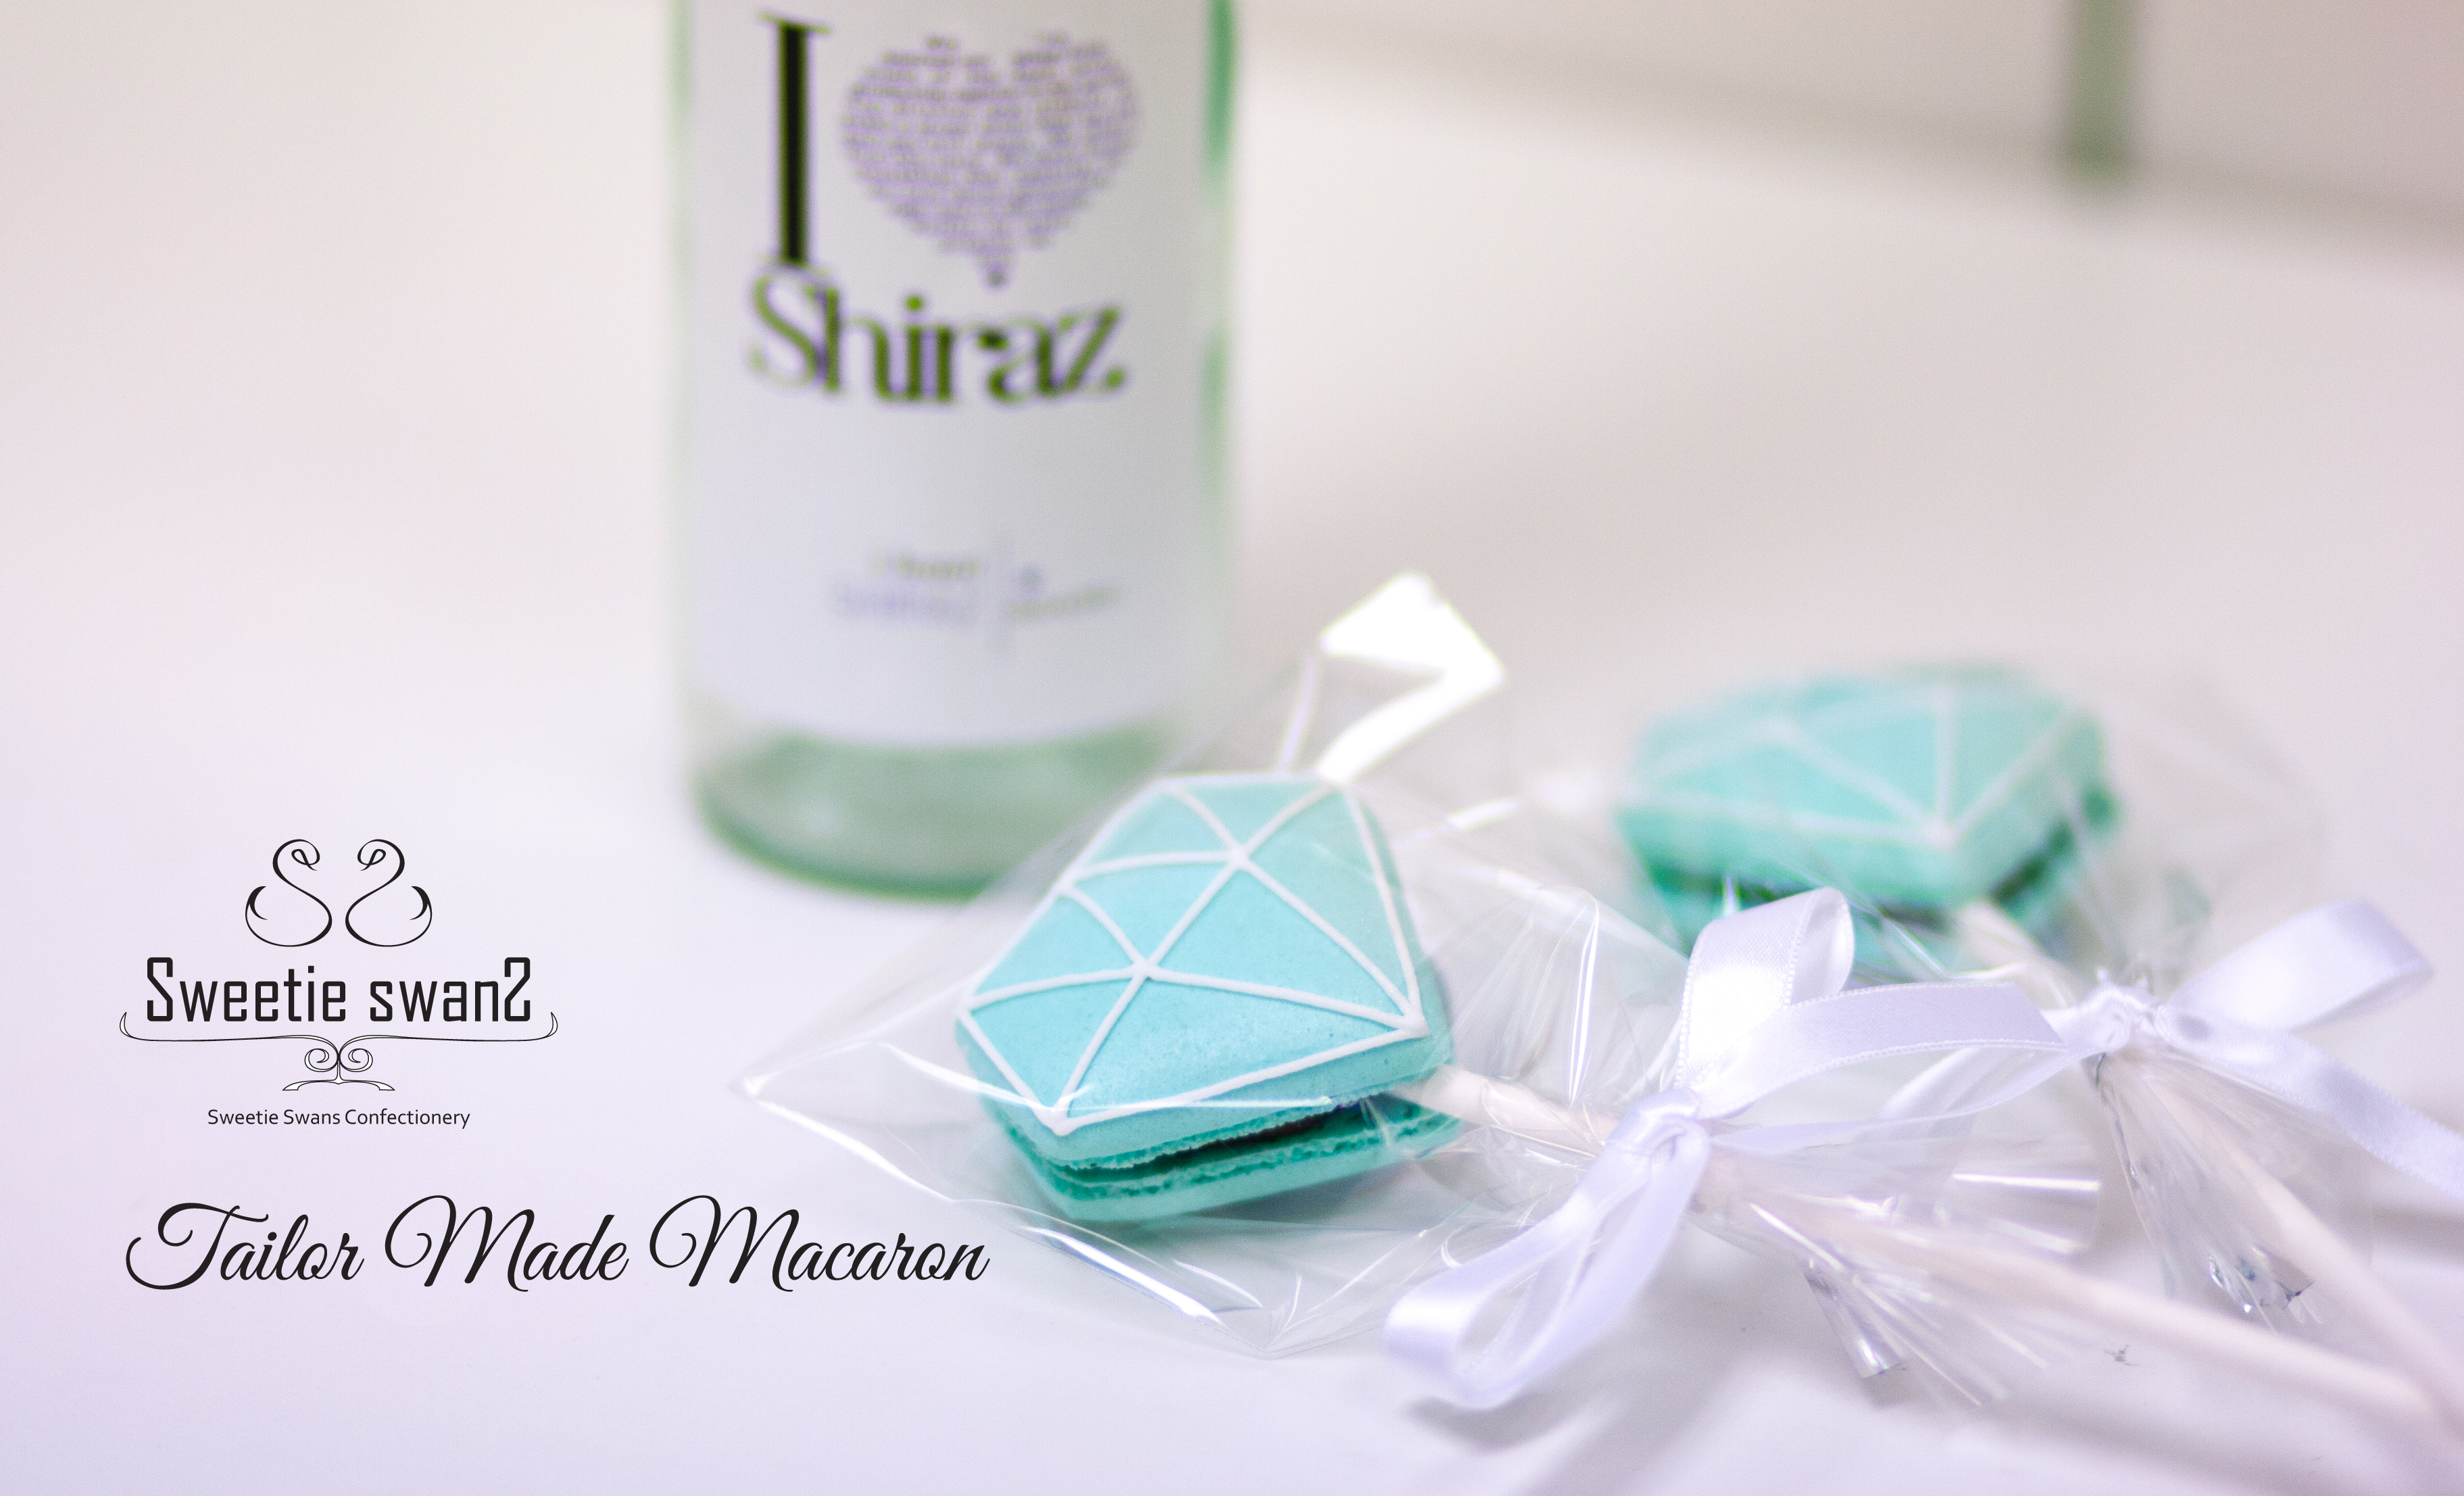 Diamond macaron